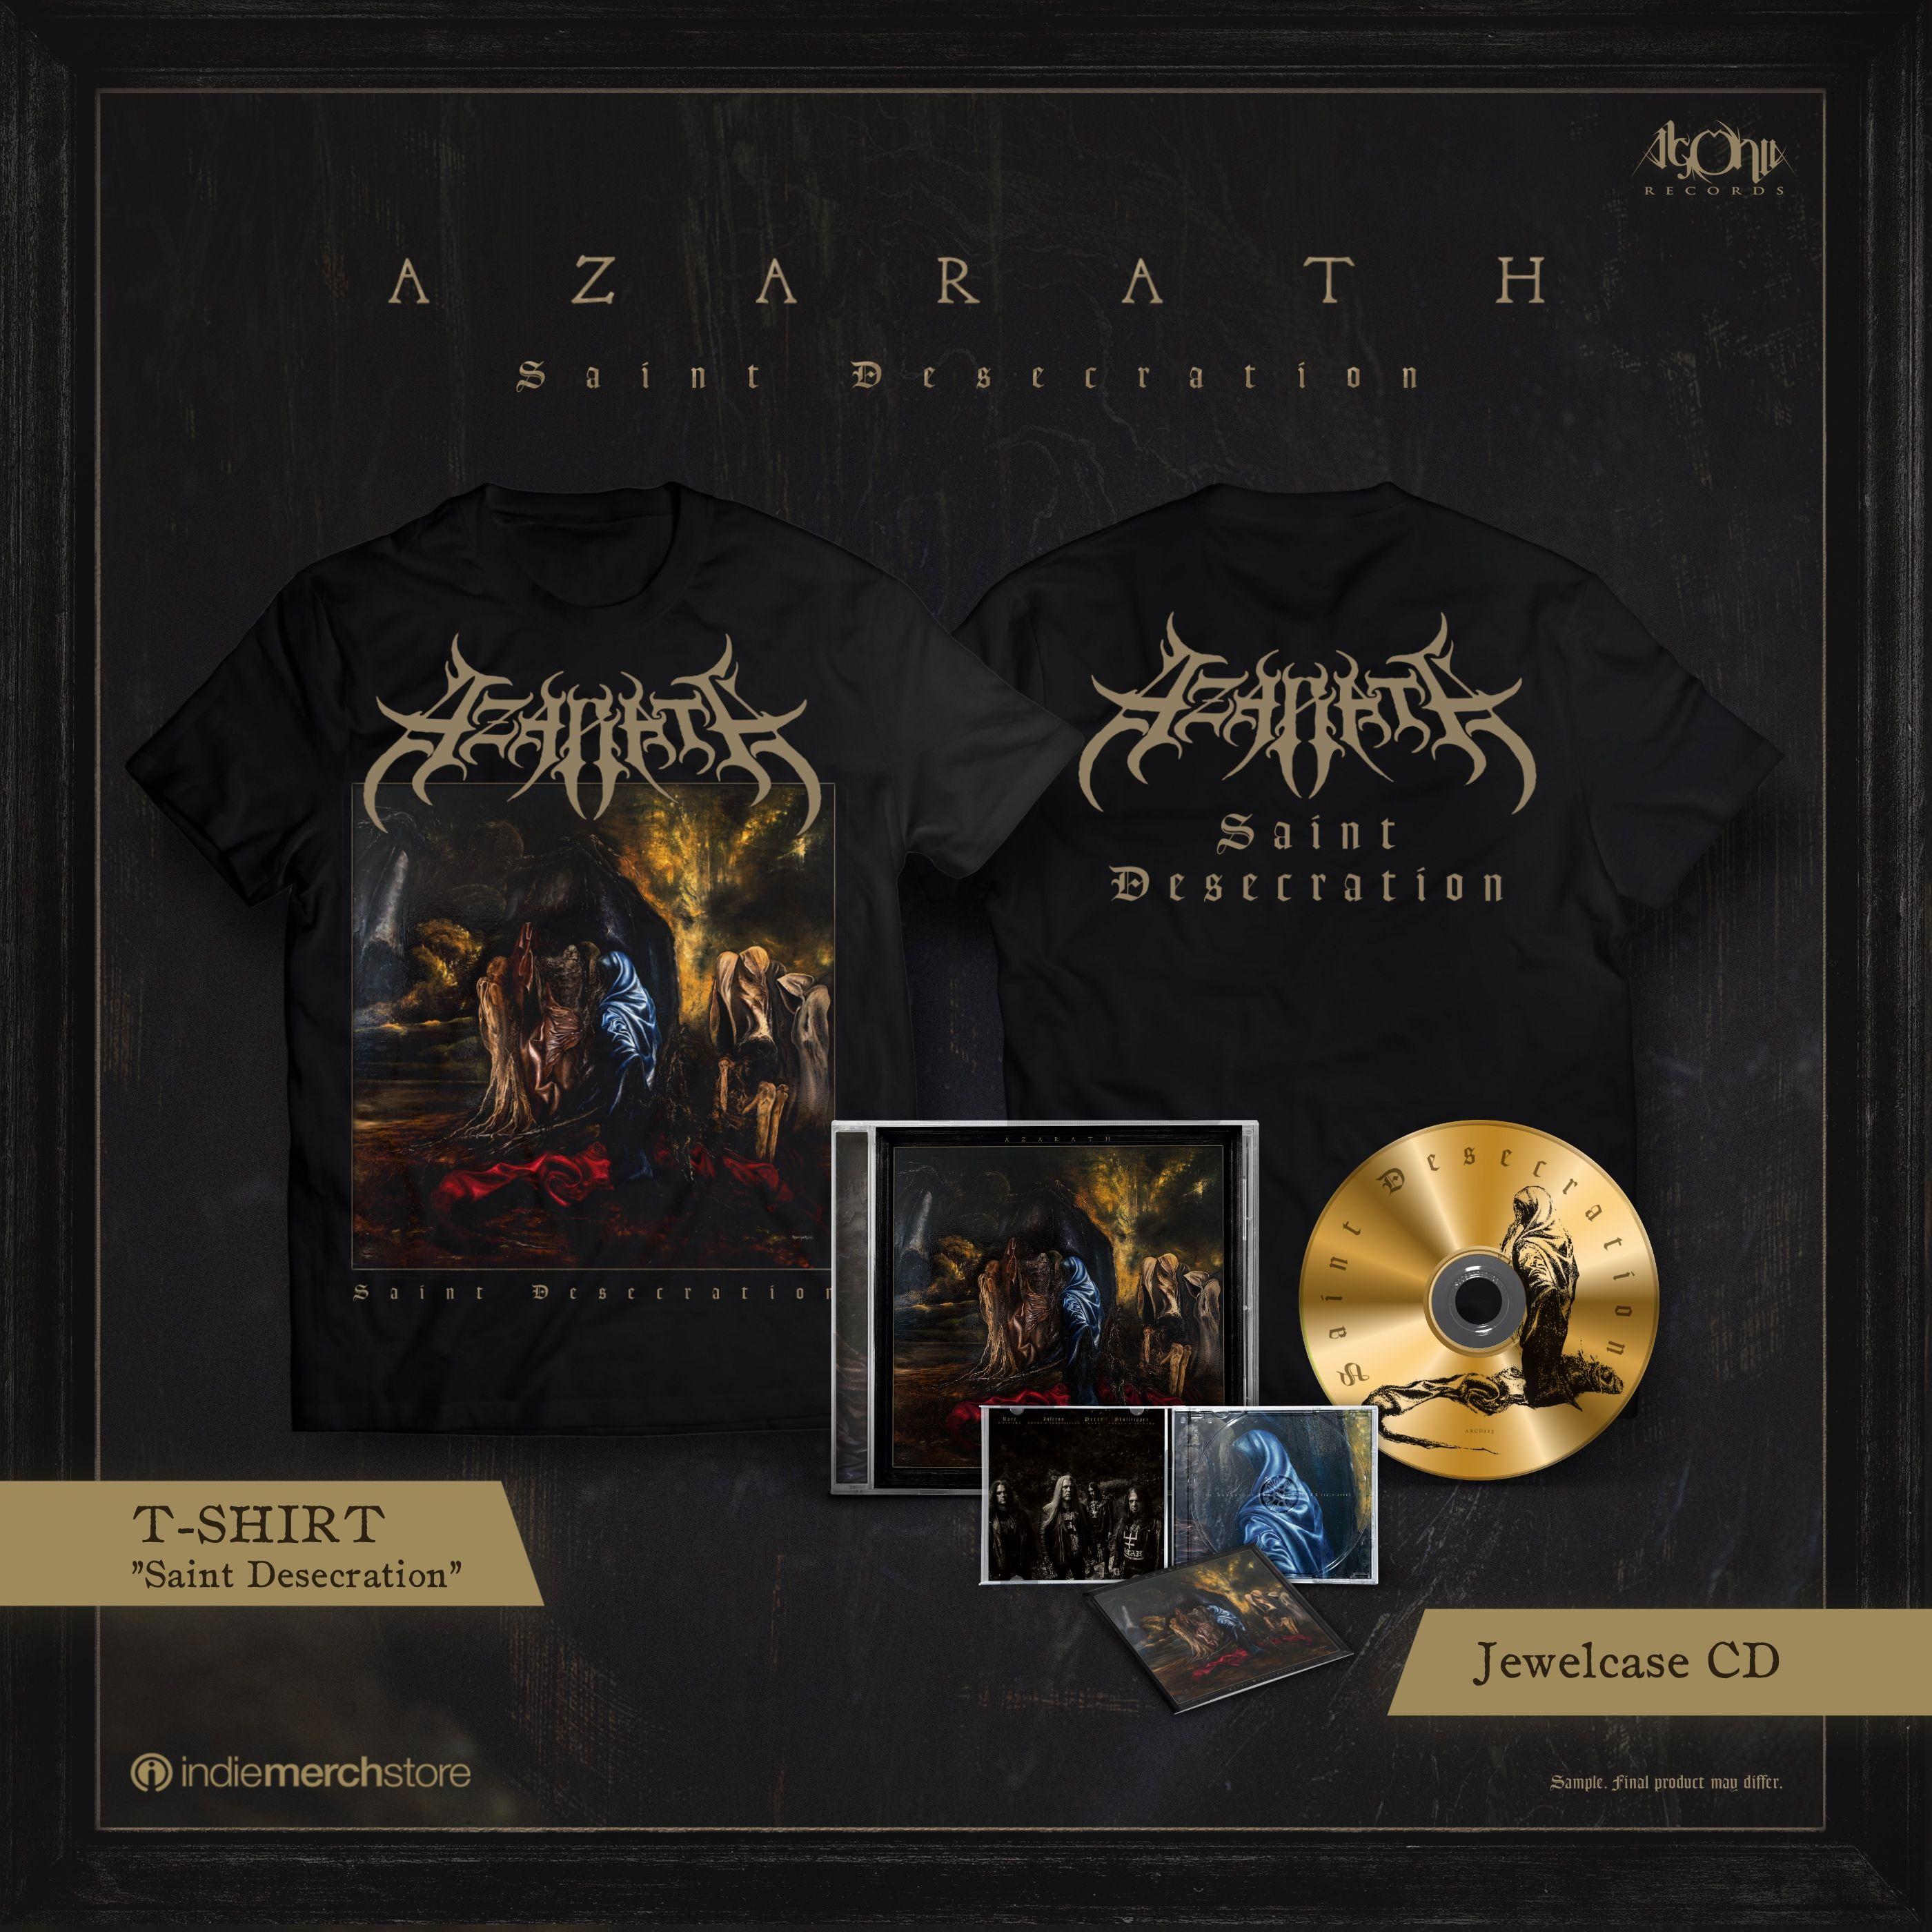 Saint Desecration Jewelcase CD + Tee Bundle